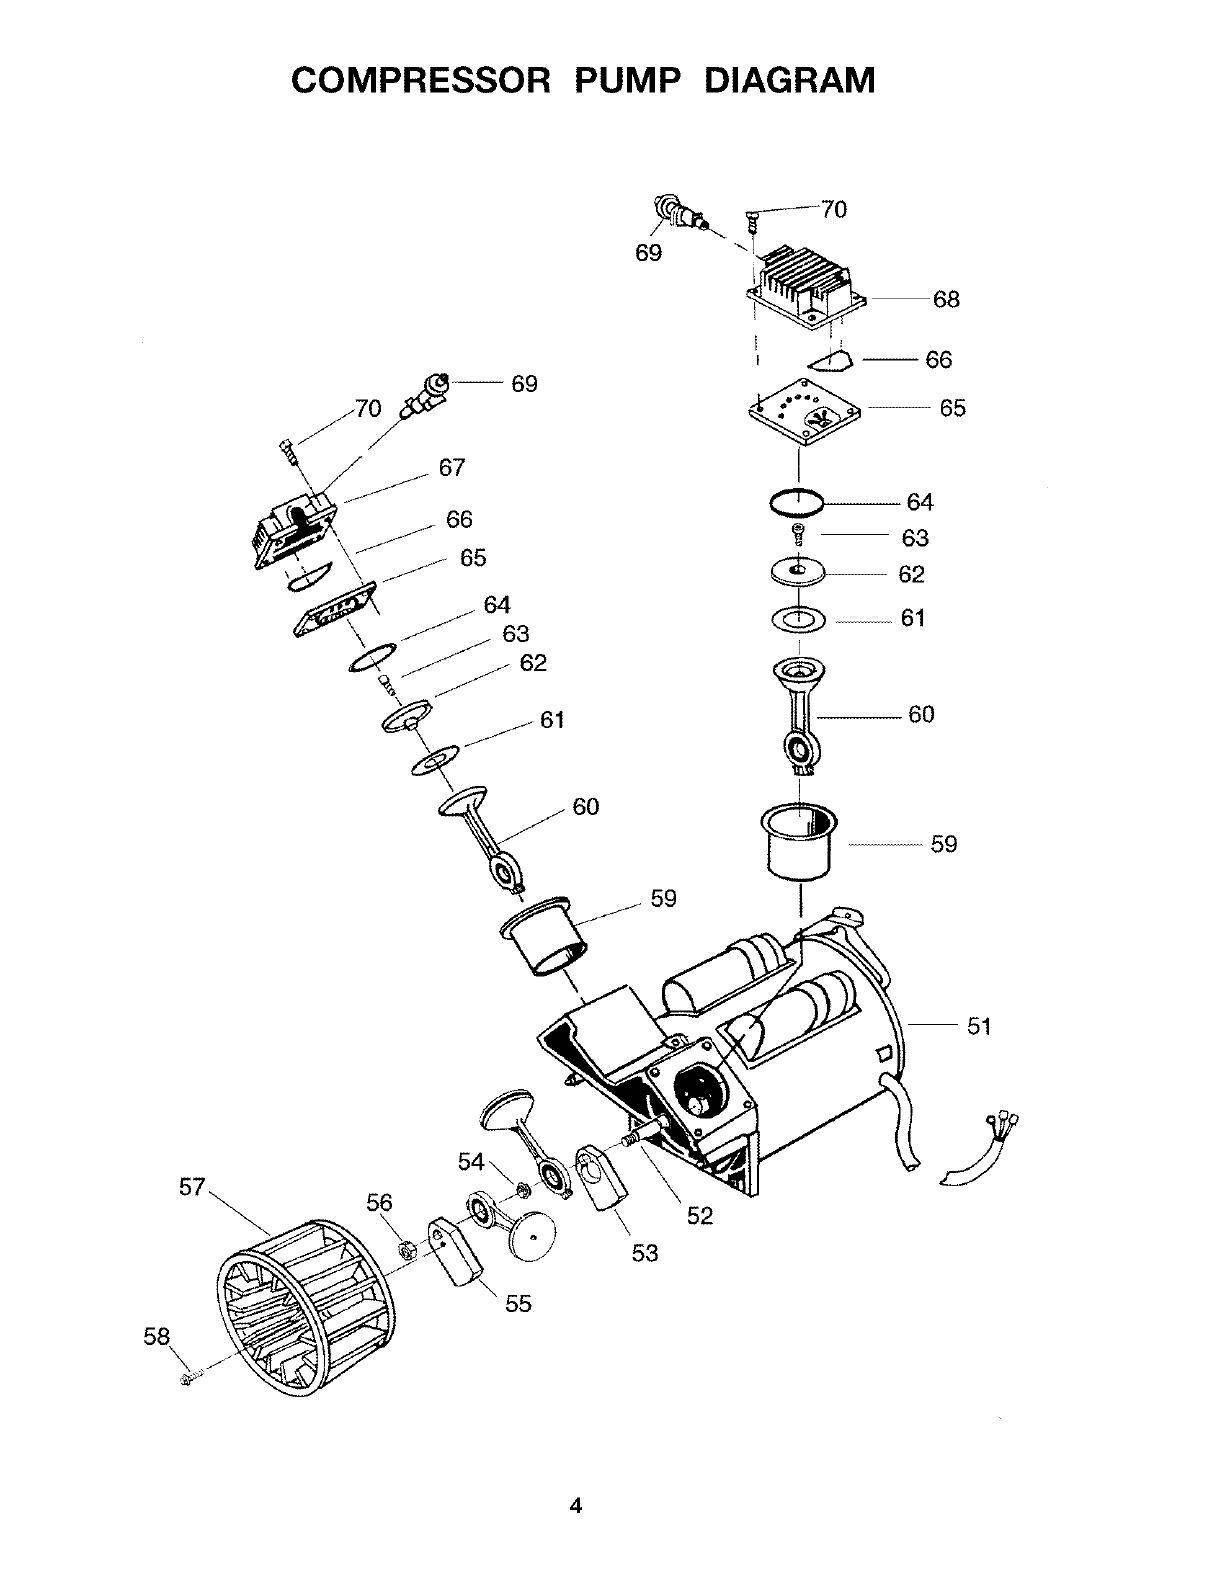 Craftsman 919165330 User Manual AIR COMPRESSOR Manuals And